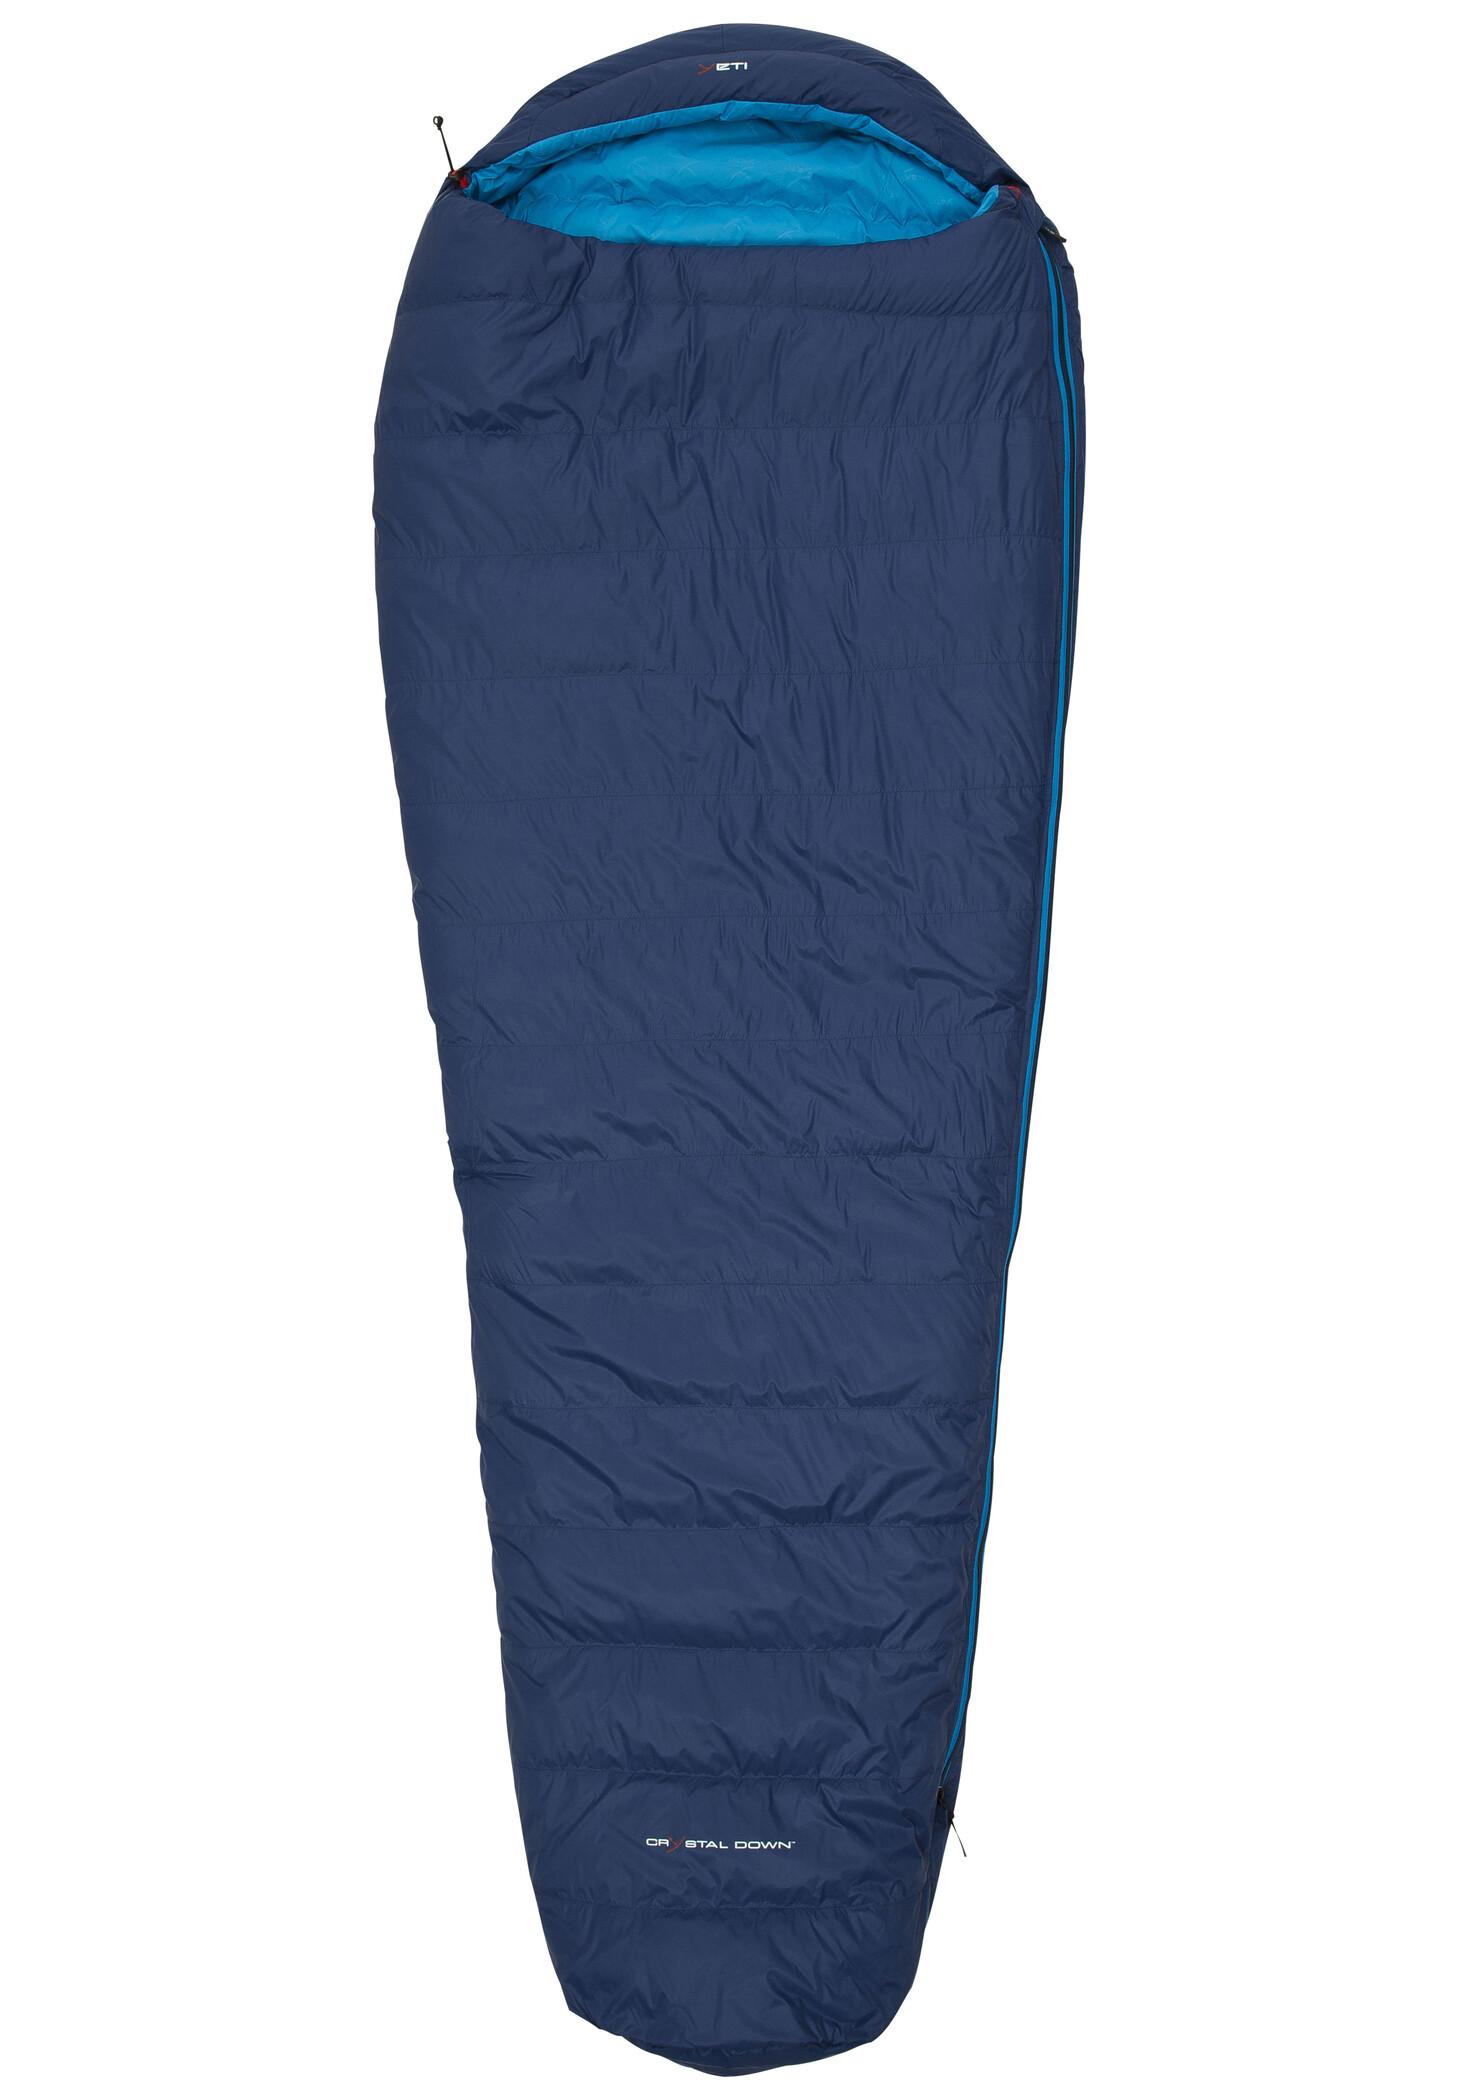 Yeti Tension Mummy 500 Sovepose M, royal blue/methyl blue (2019) | Misc. Transportation and Storage